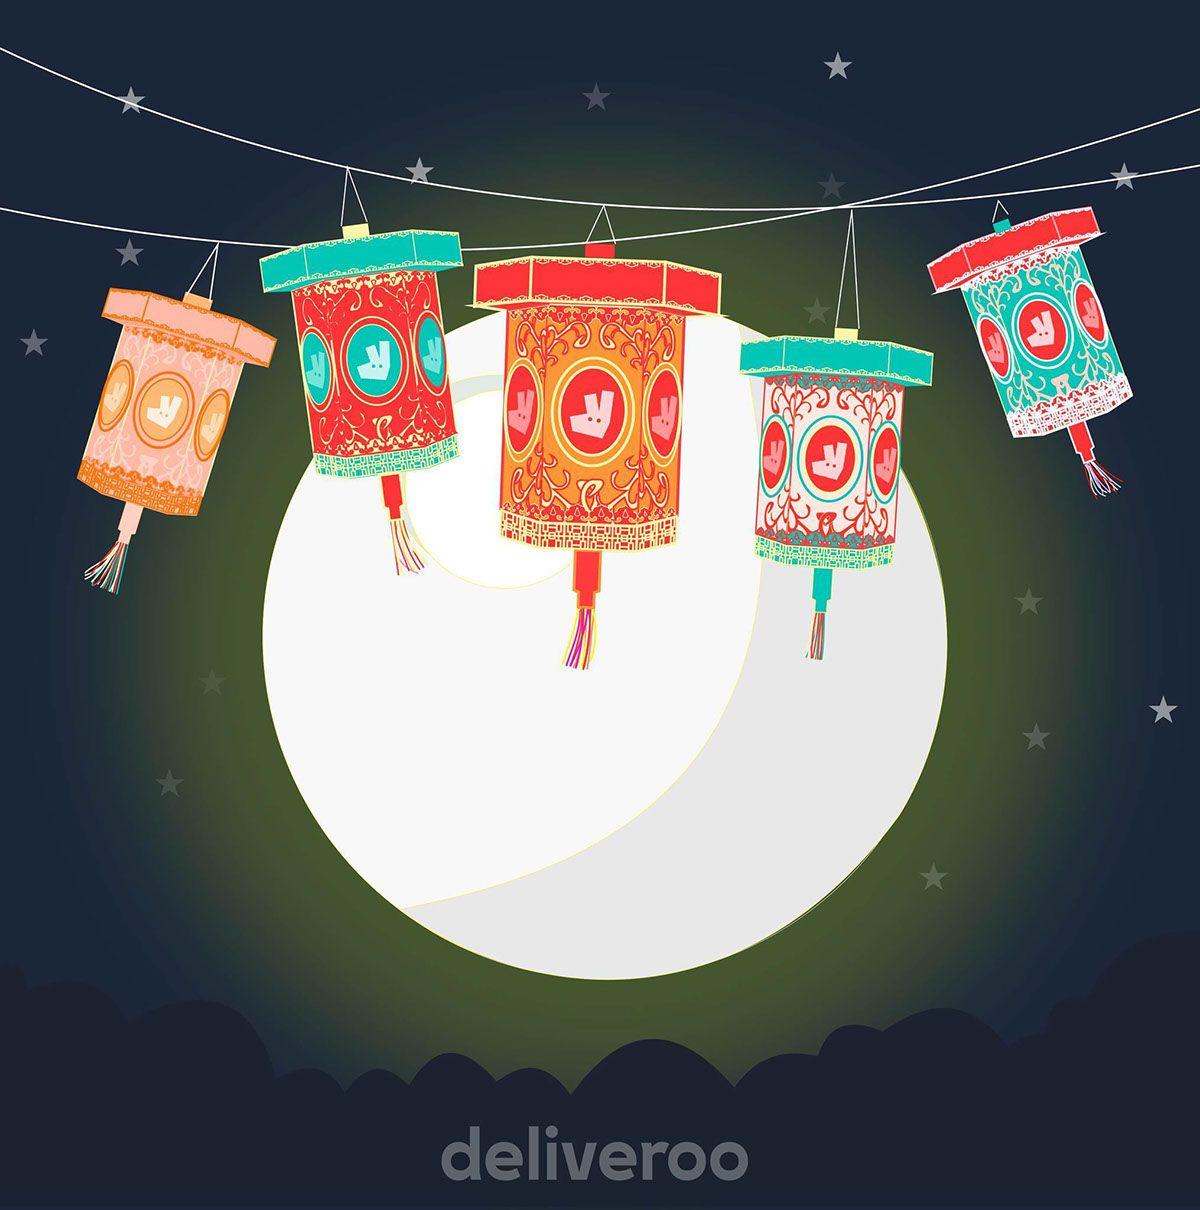 Deliveroo Hk Mid Autumn Festival Champaign On Behance